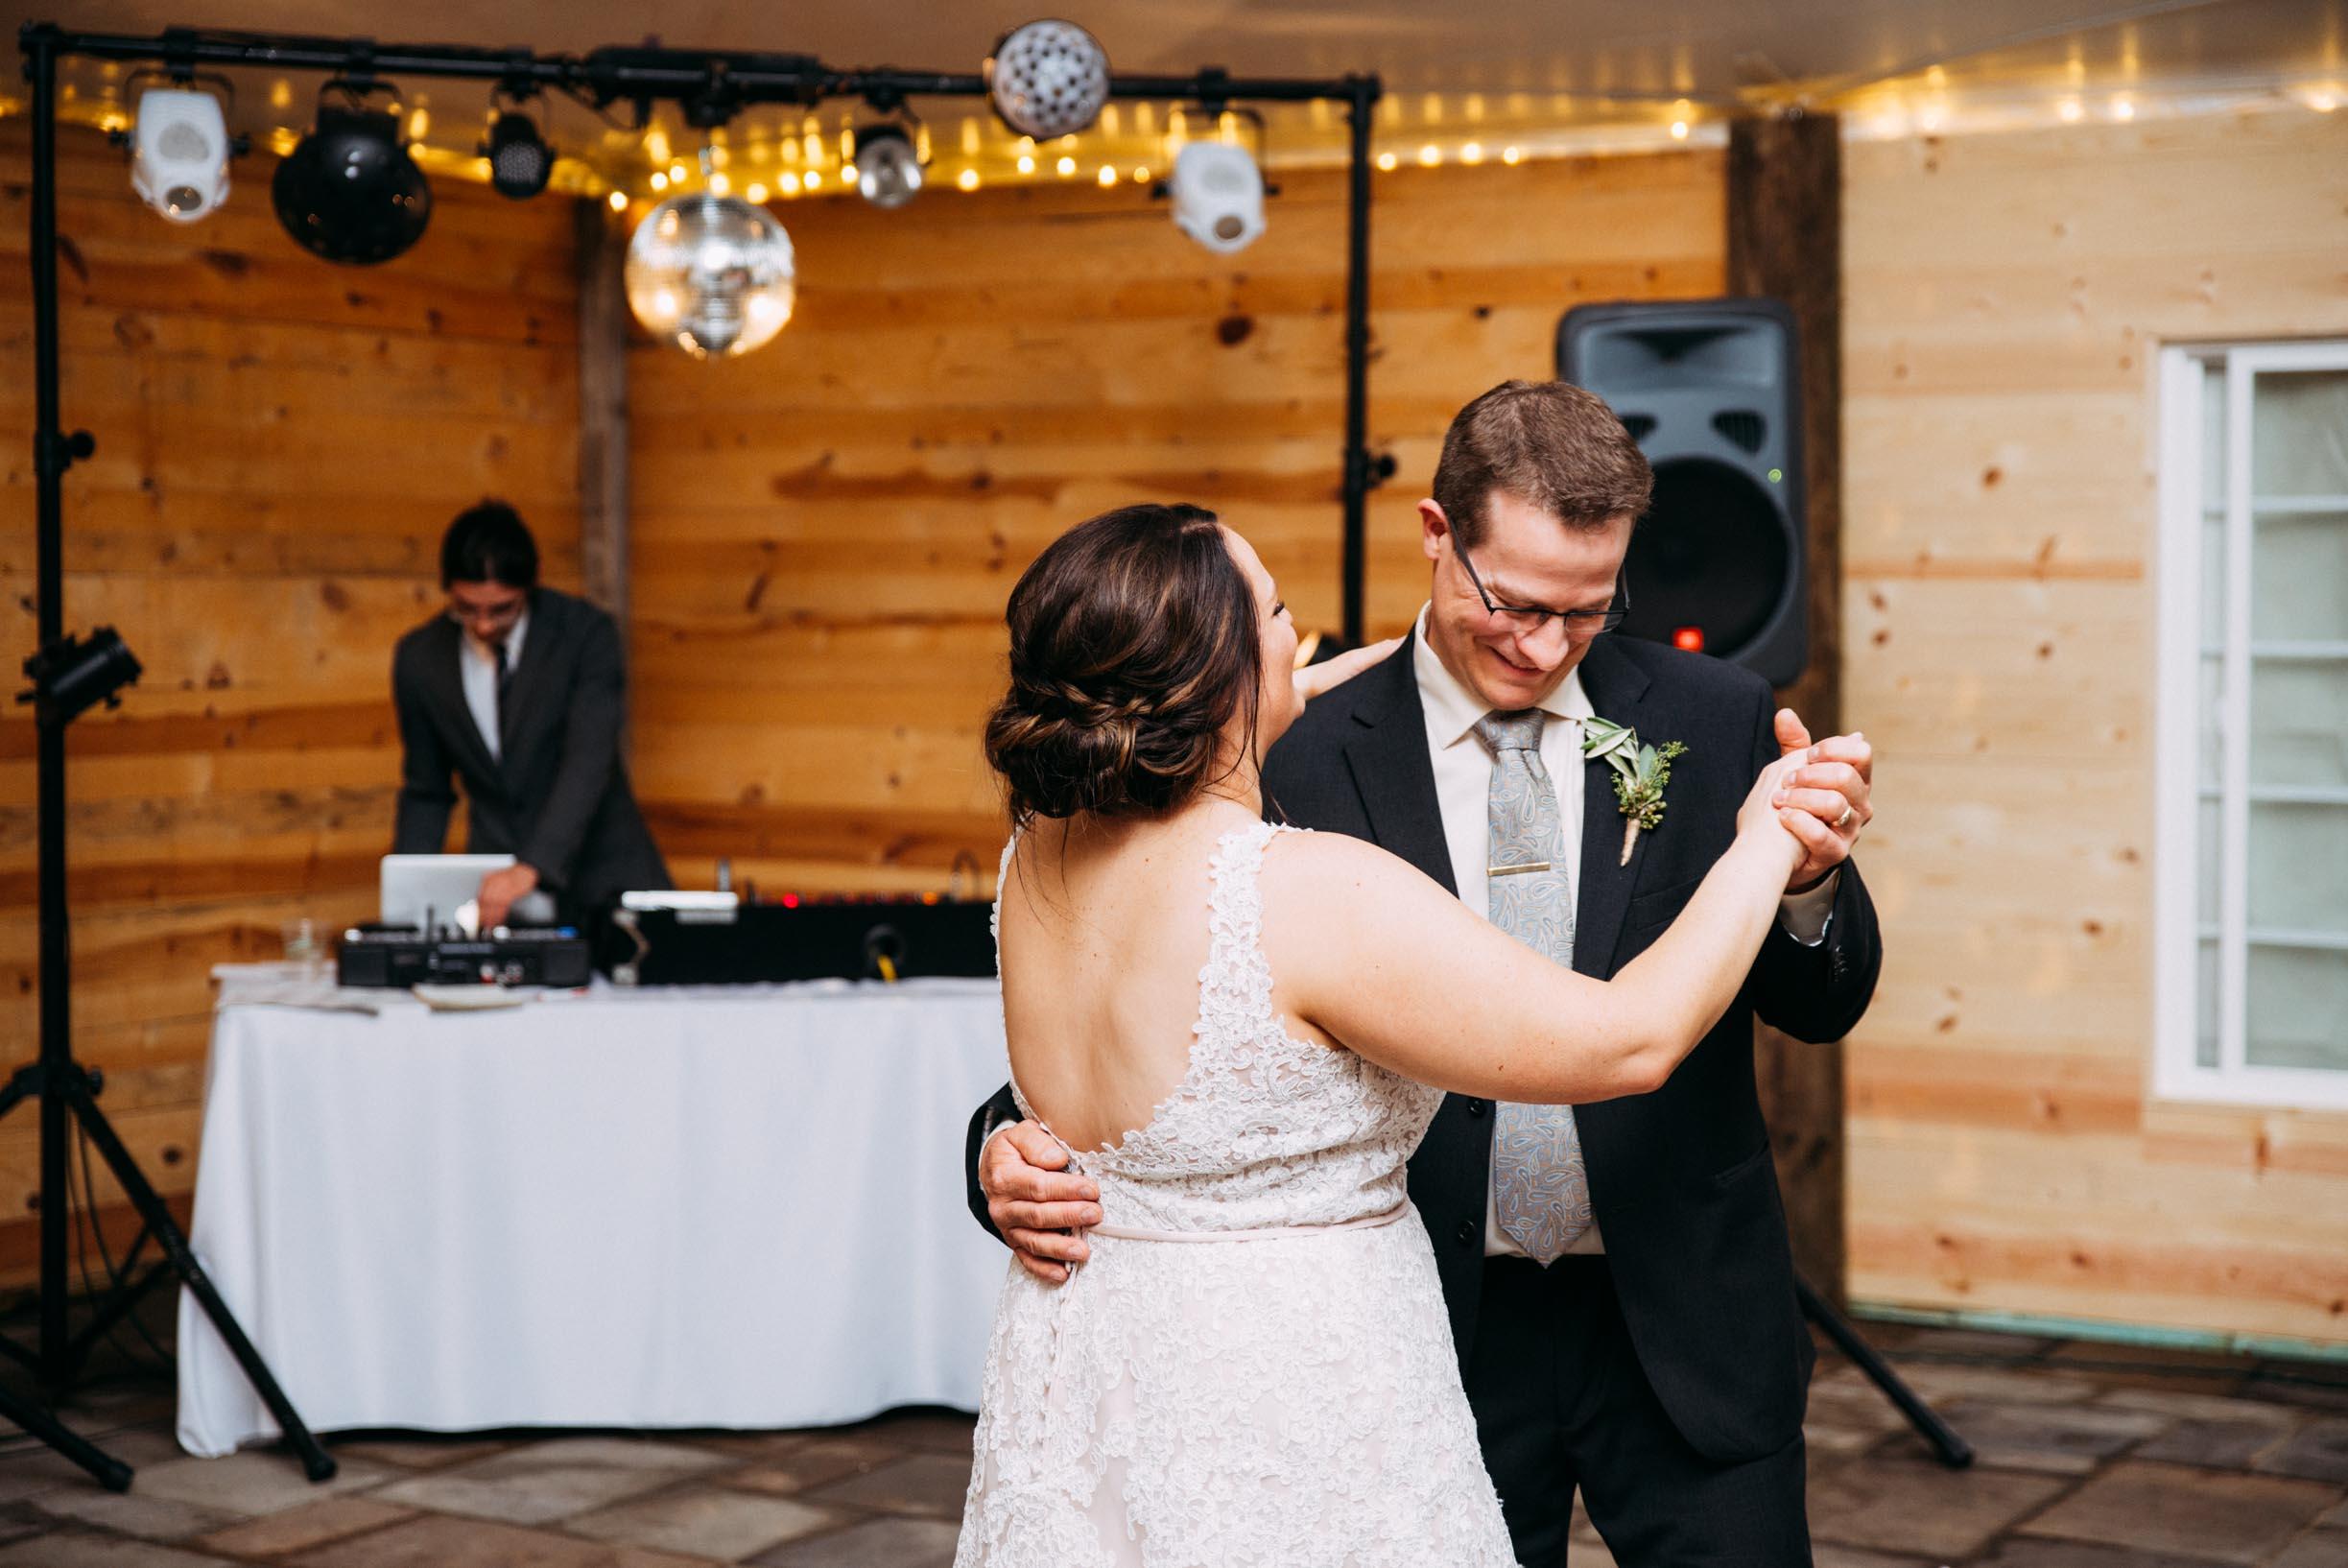 67-Jess_Jeremy_Minnesota_Wedding.jpg